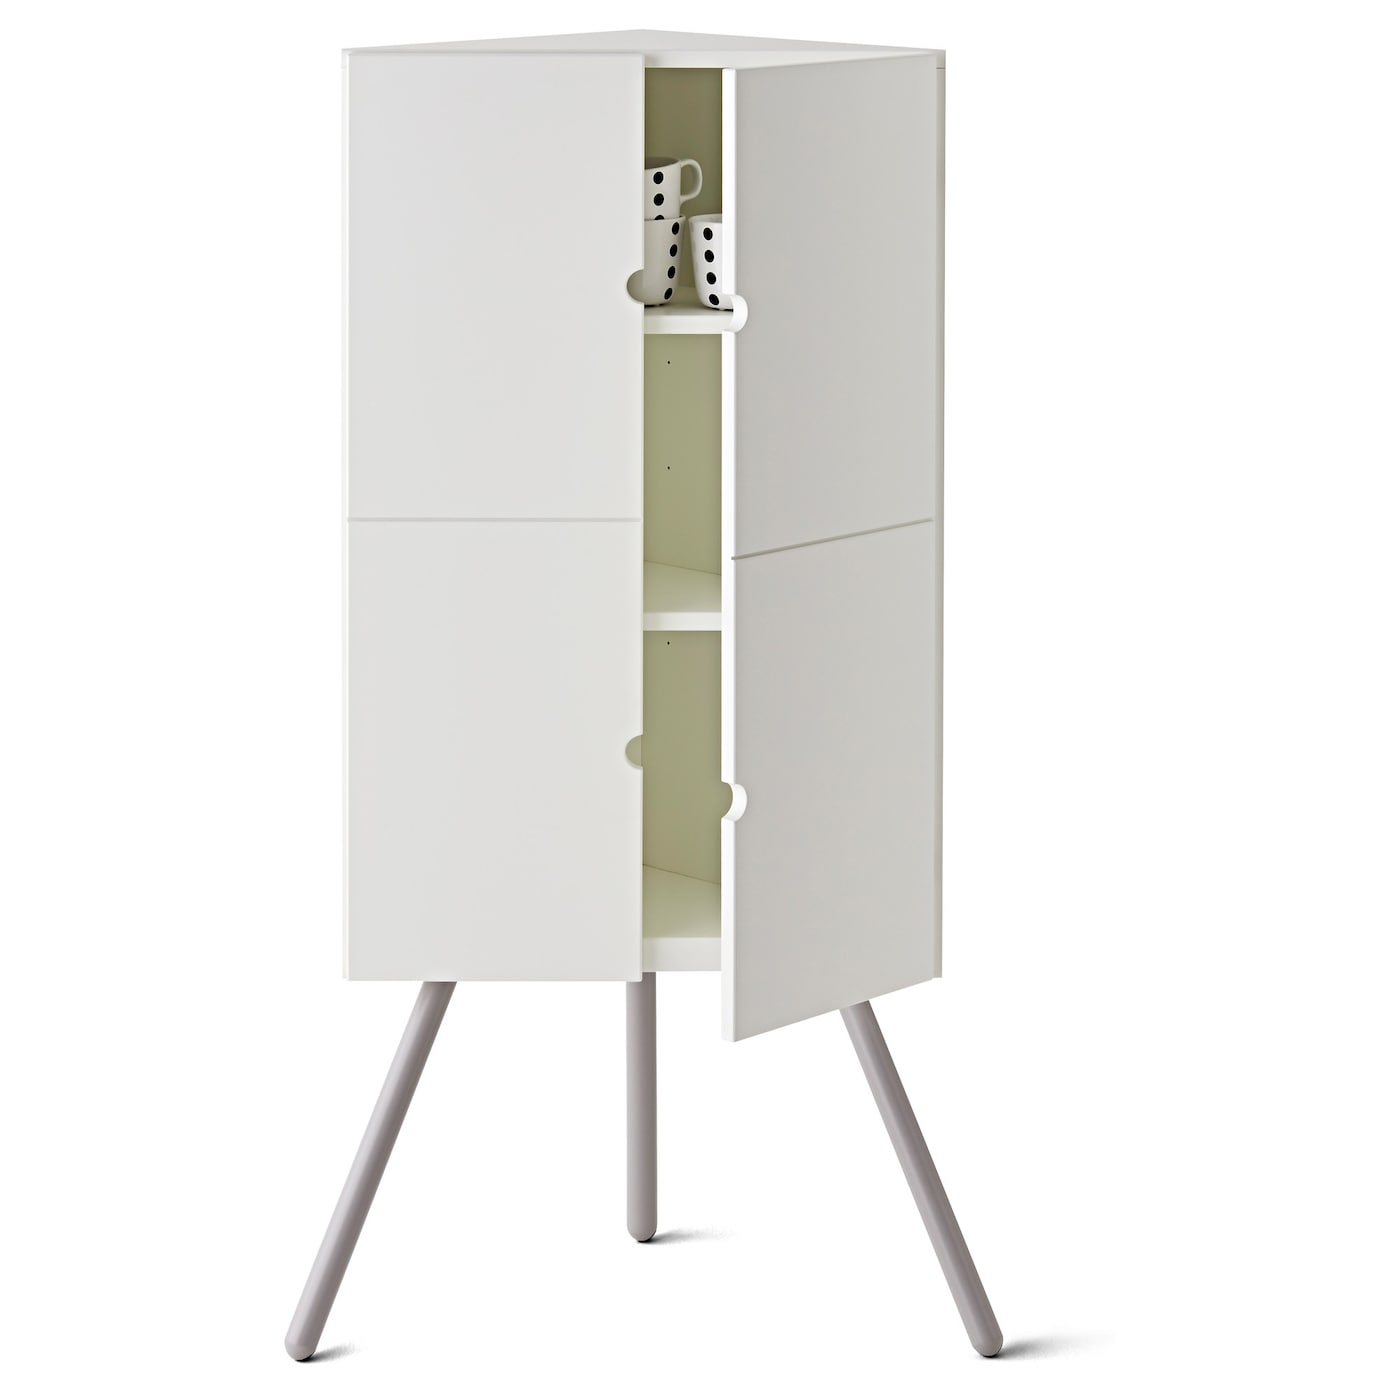 IKEA PS 2014 Corner cabinet White grey 52×110 cm  IKEA